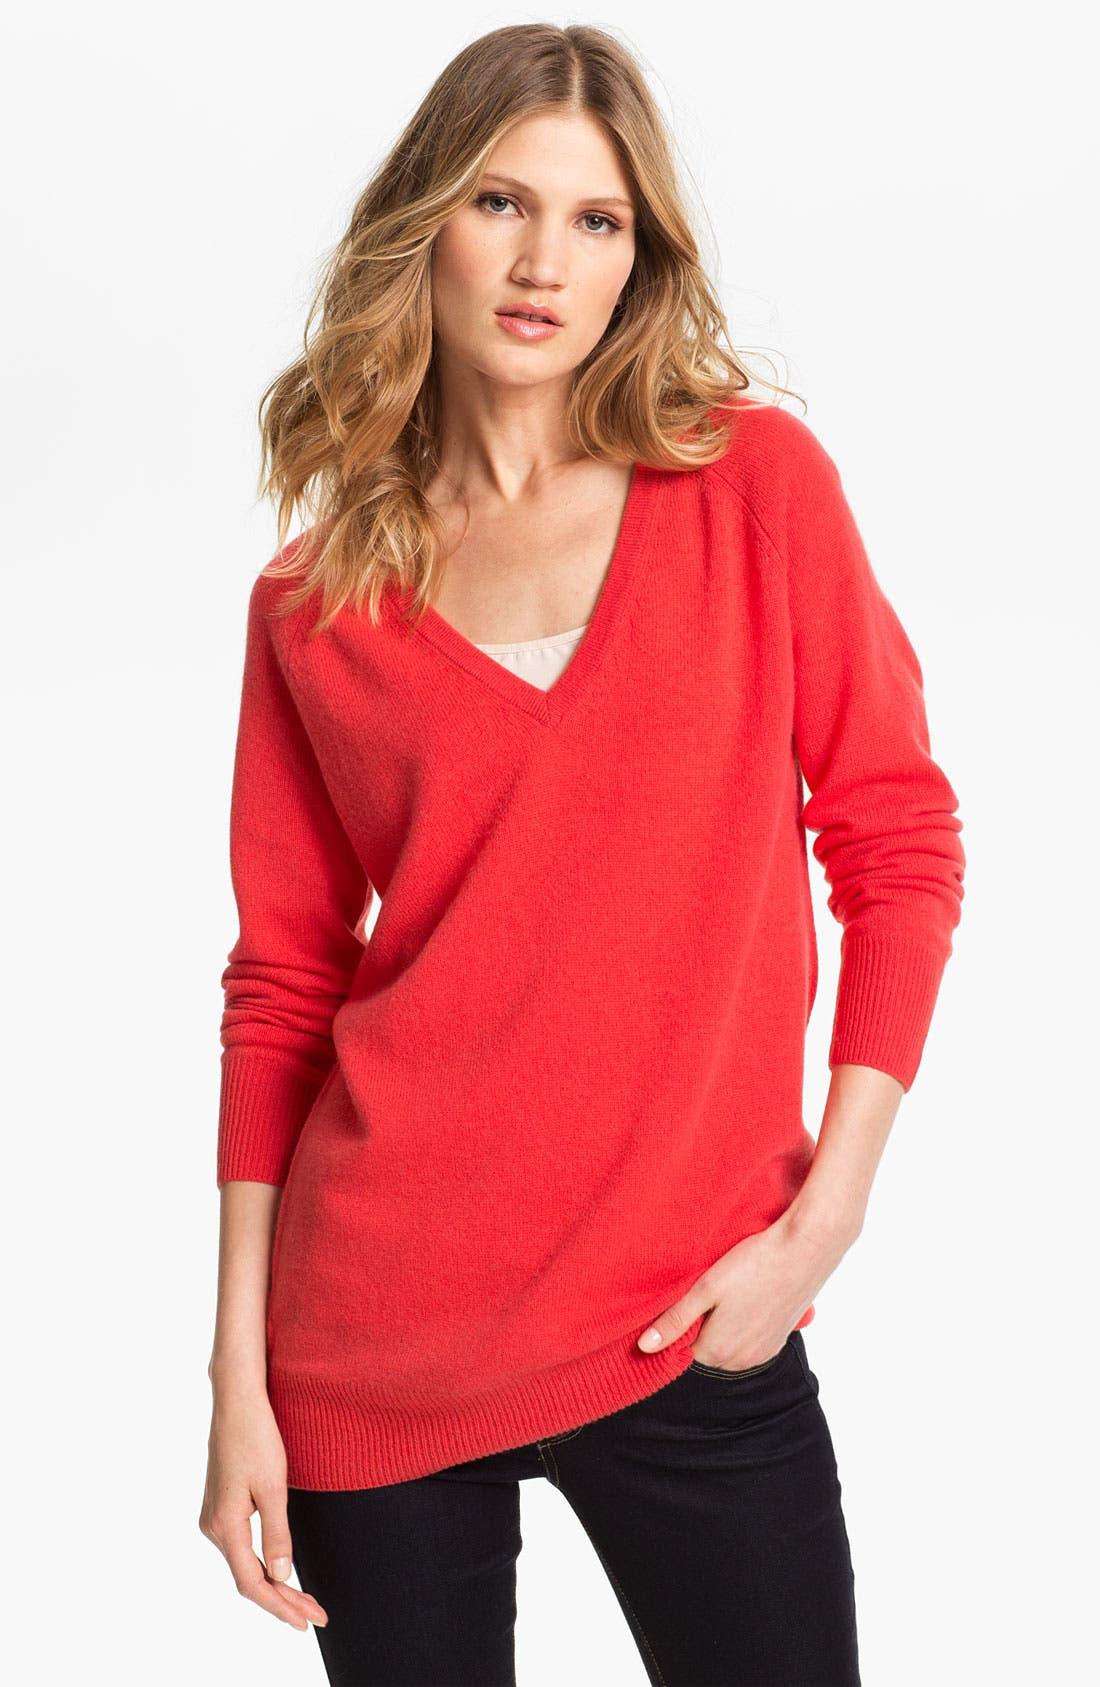 Alternate Image 1 Selected - Equipment 'Asher' V-Neck Cashmere Sweater